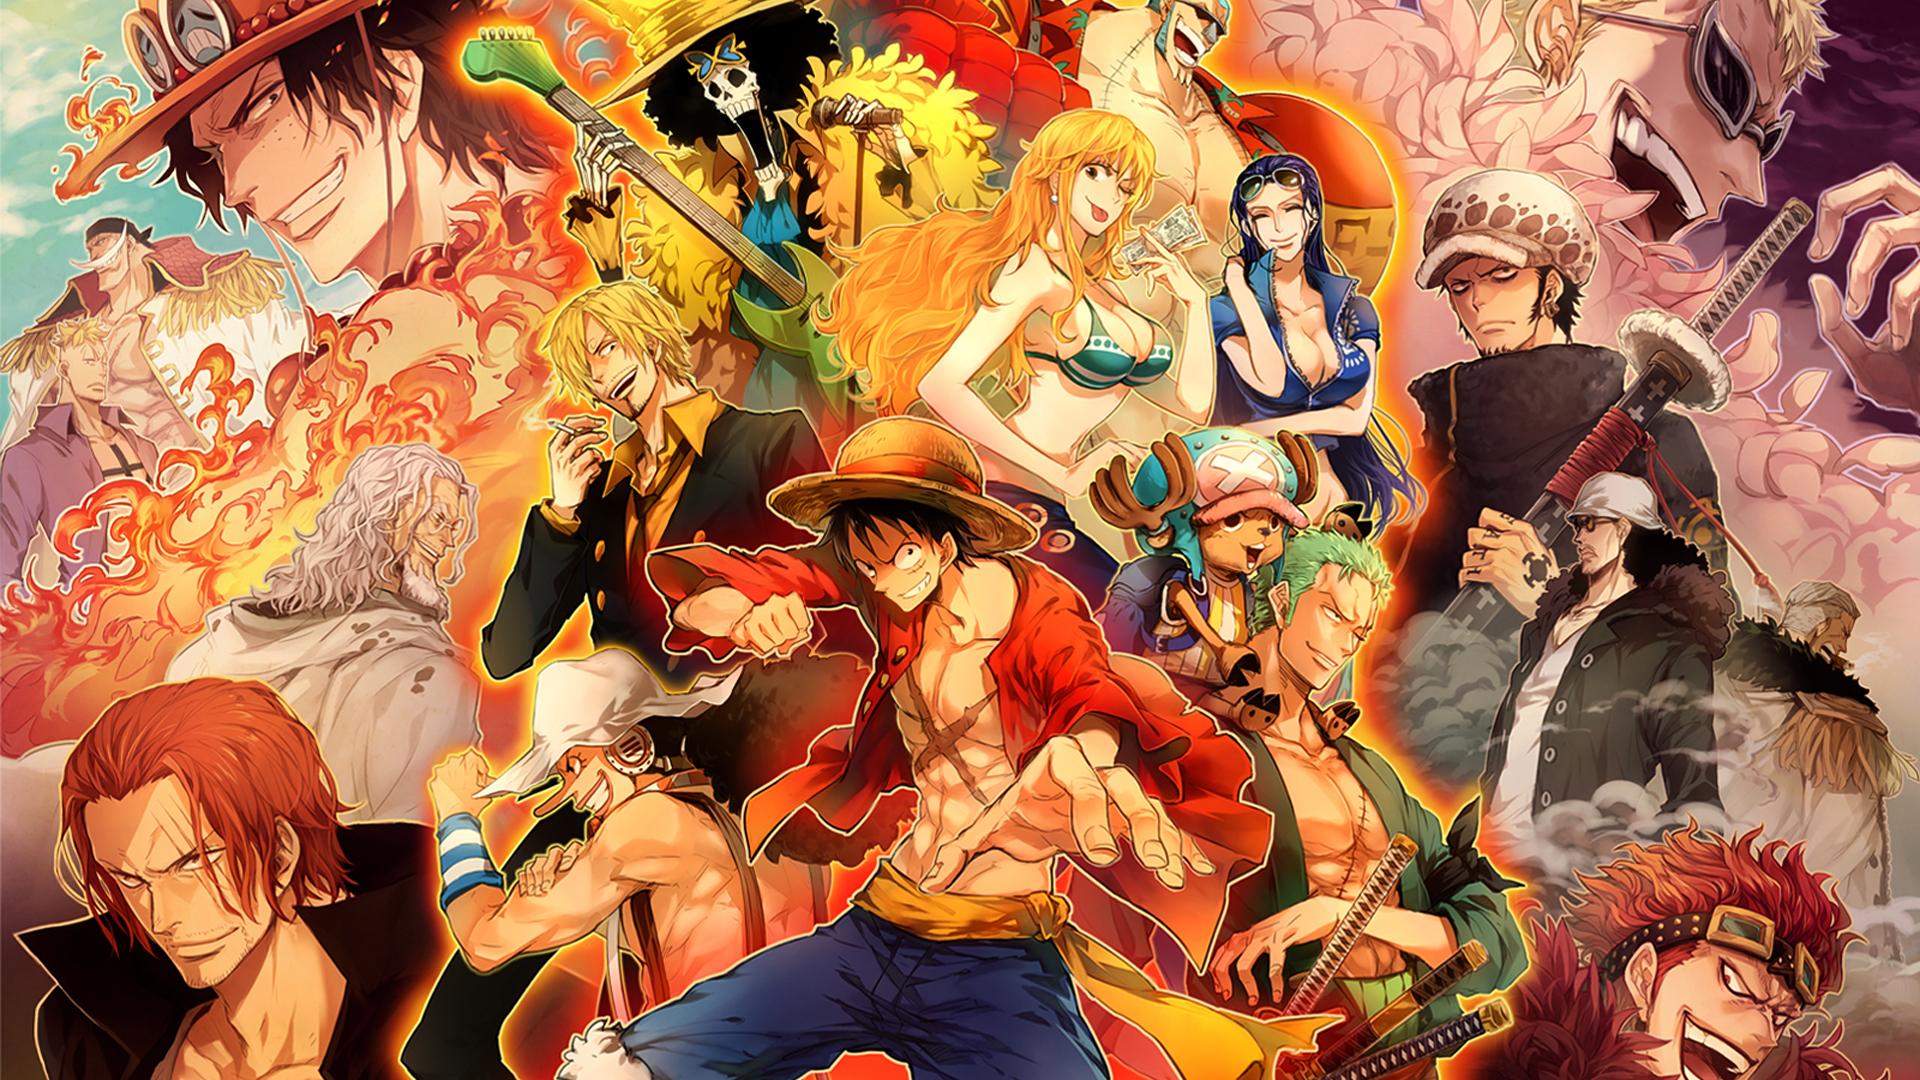 75 One Piece Ace Wallpaper On Wallpapersafari